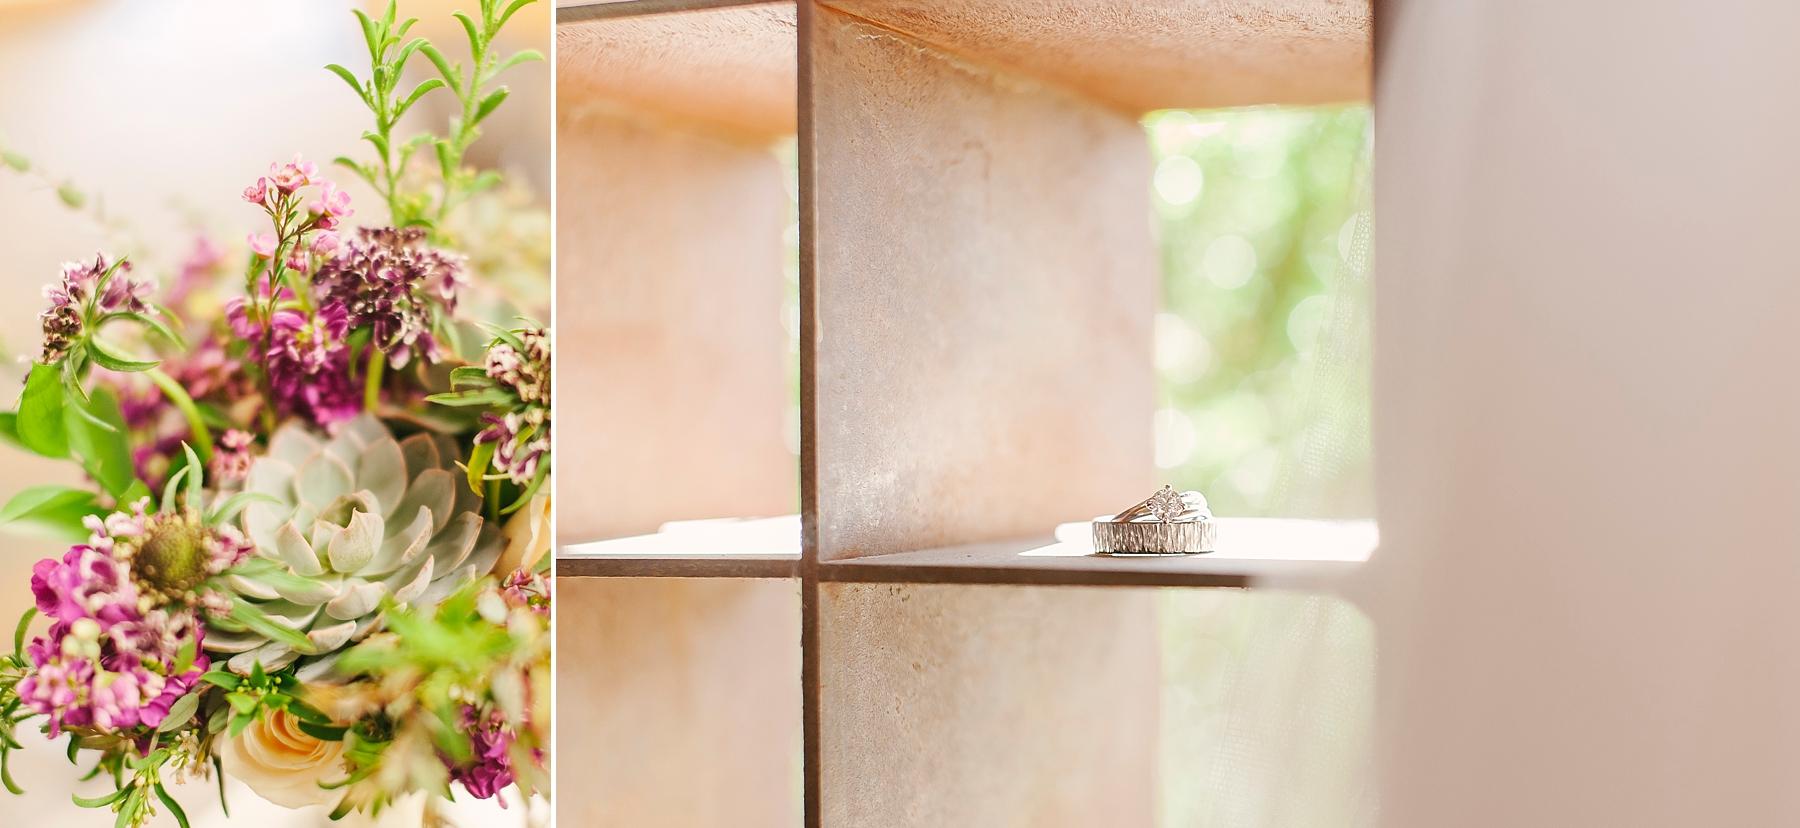 springs-preserve-wedding-las-vegas-destination-photography-the-emerics-04.jpg